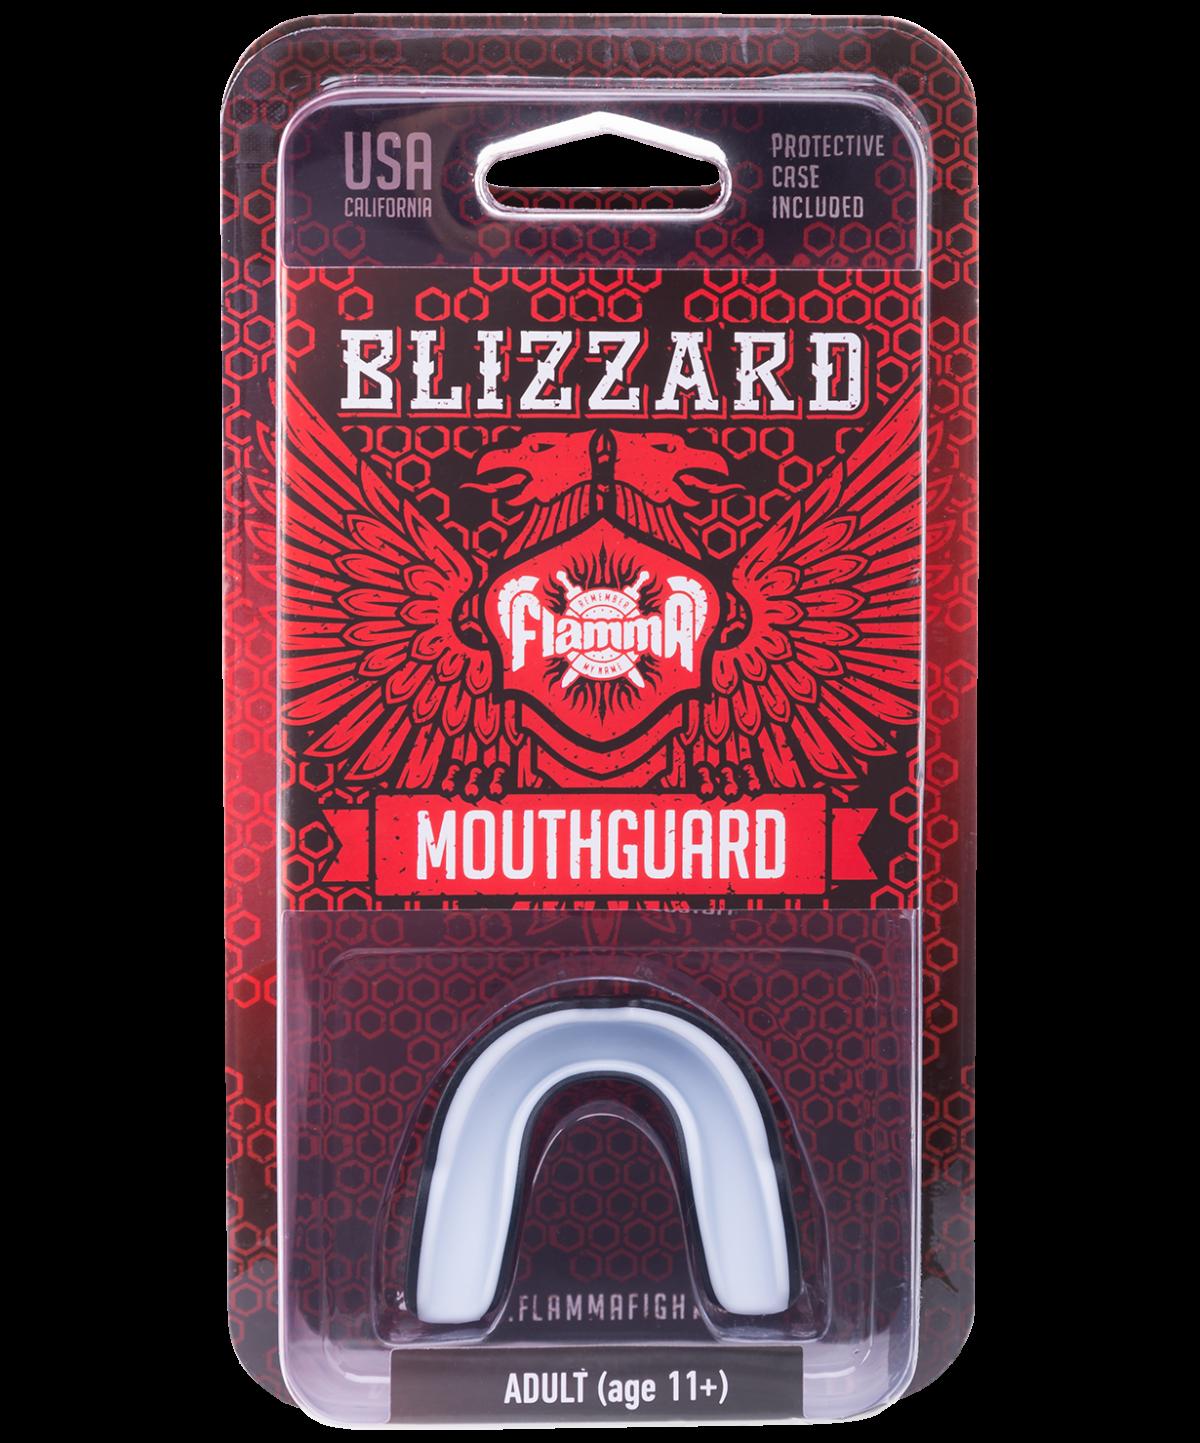 FLAMMA  Капа с футляром, взрослая Blizzard  MGF-031 mstr взрос. - 4